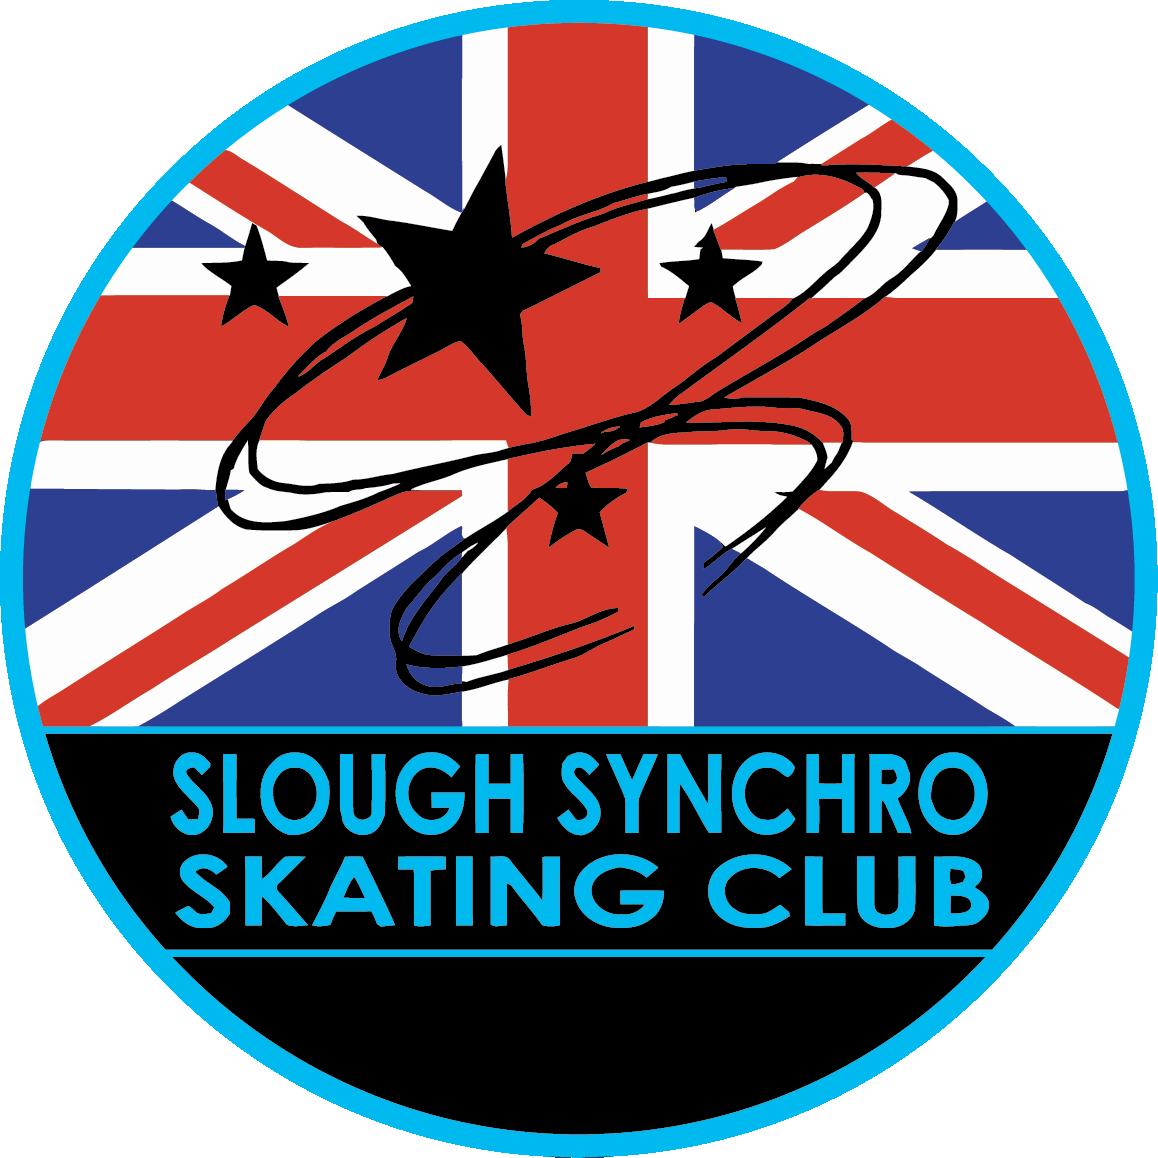 Slough Synchro